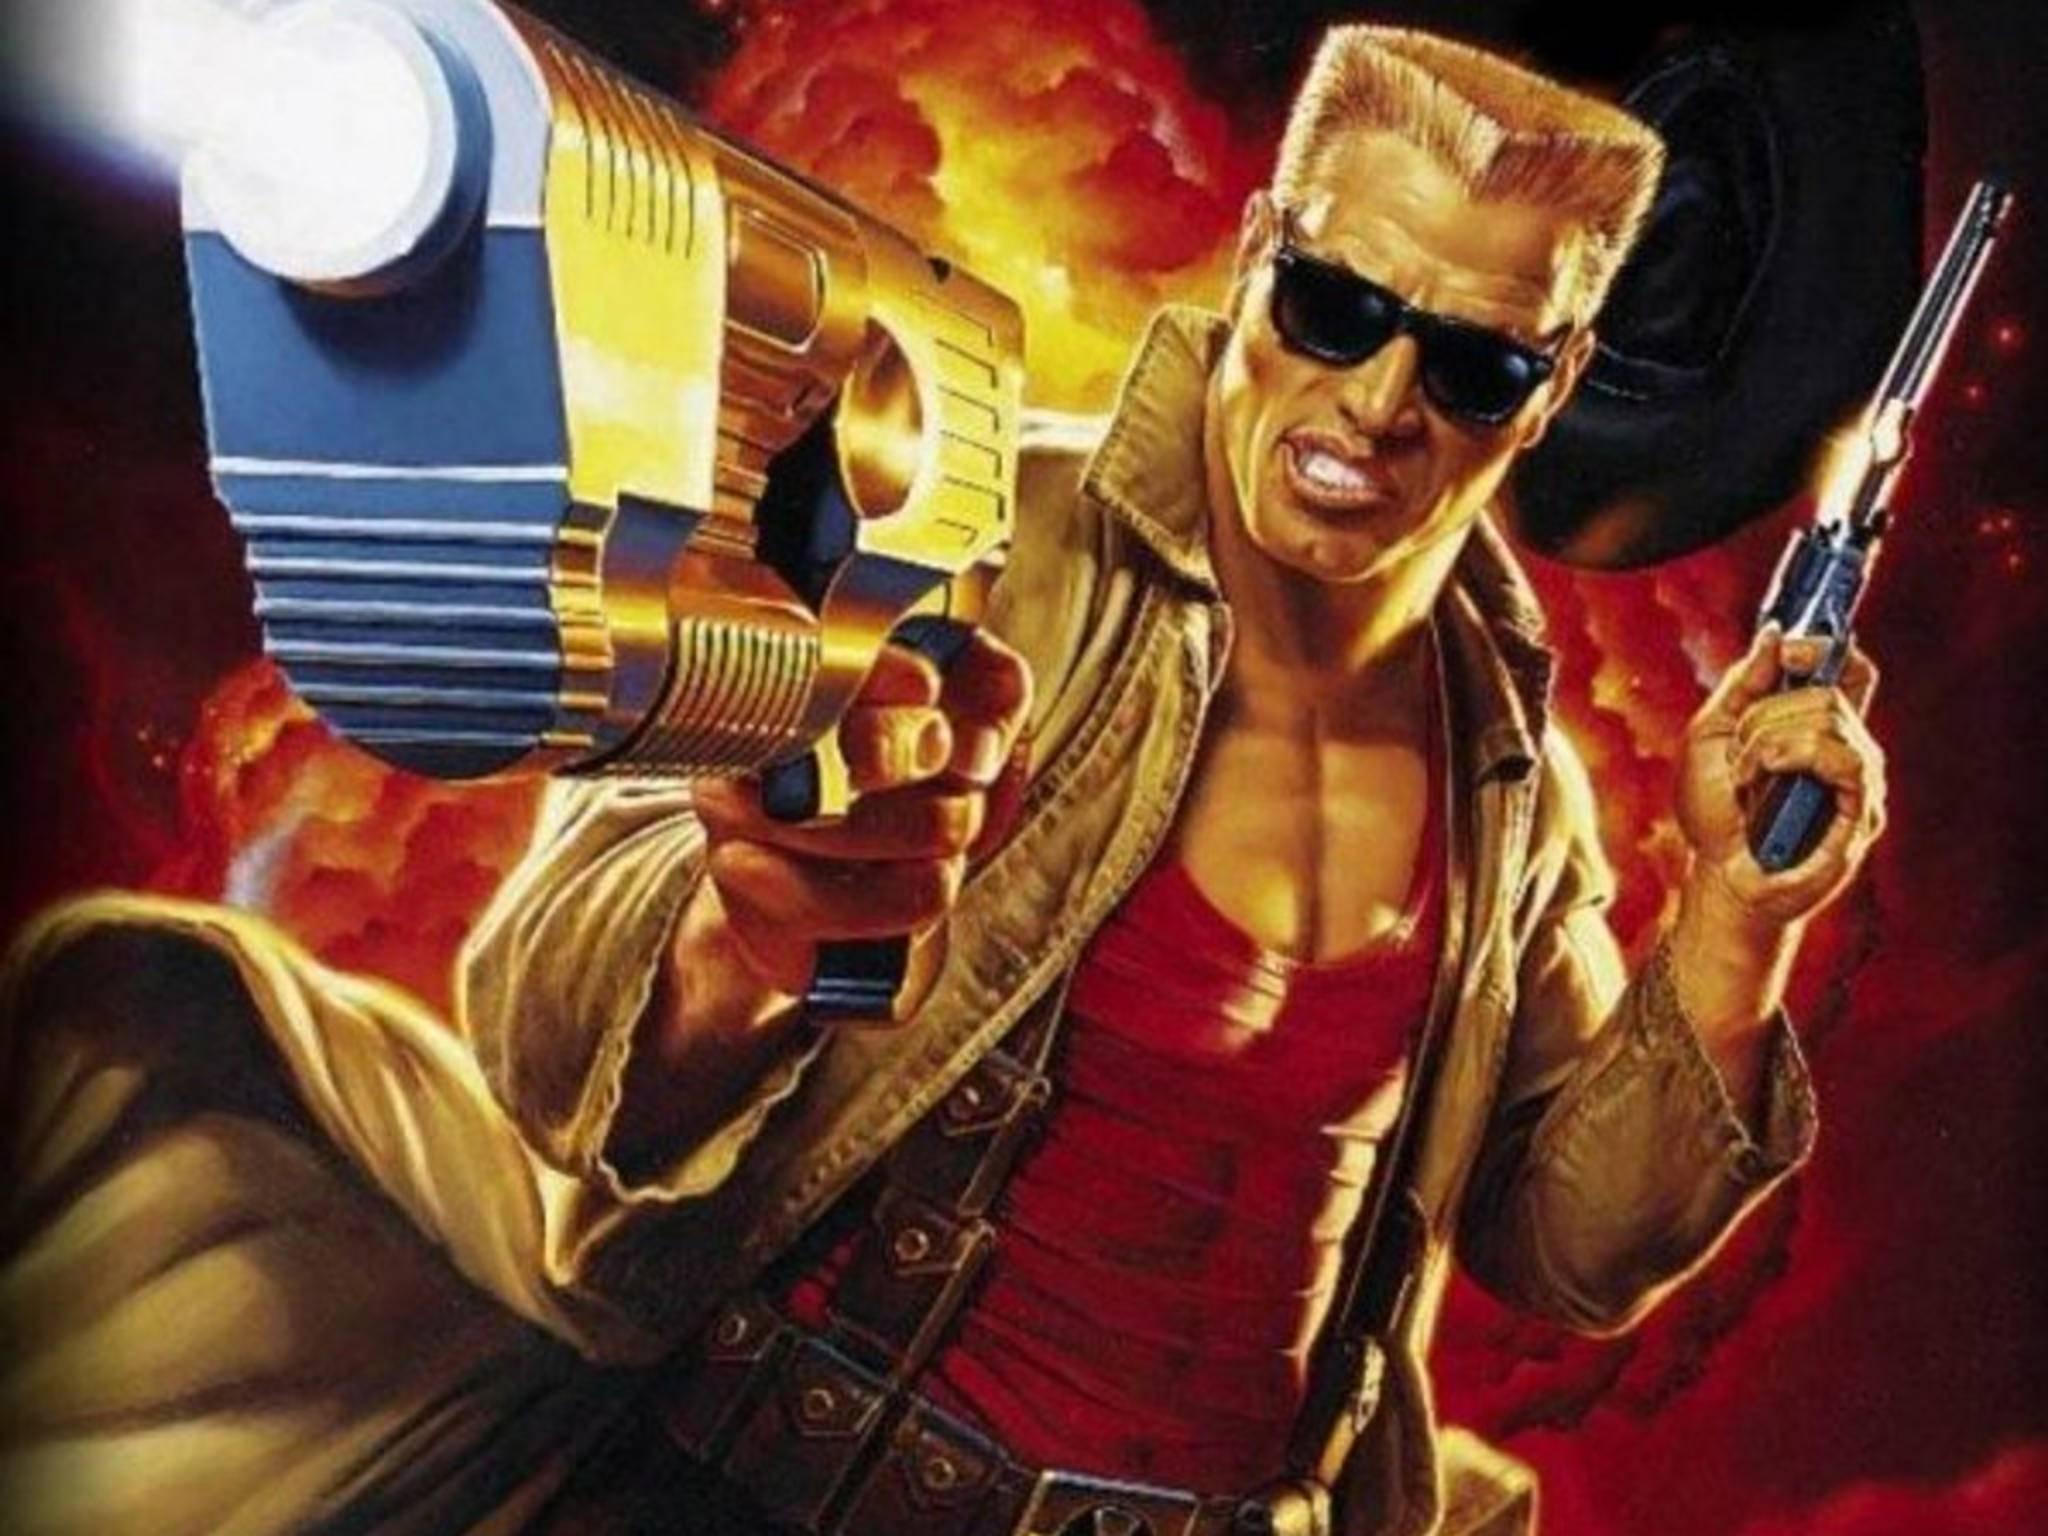 Hinweise auf Comeback: Kehrt Duke Nukem zurück?